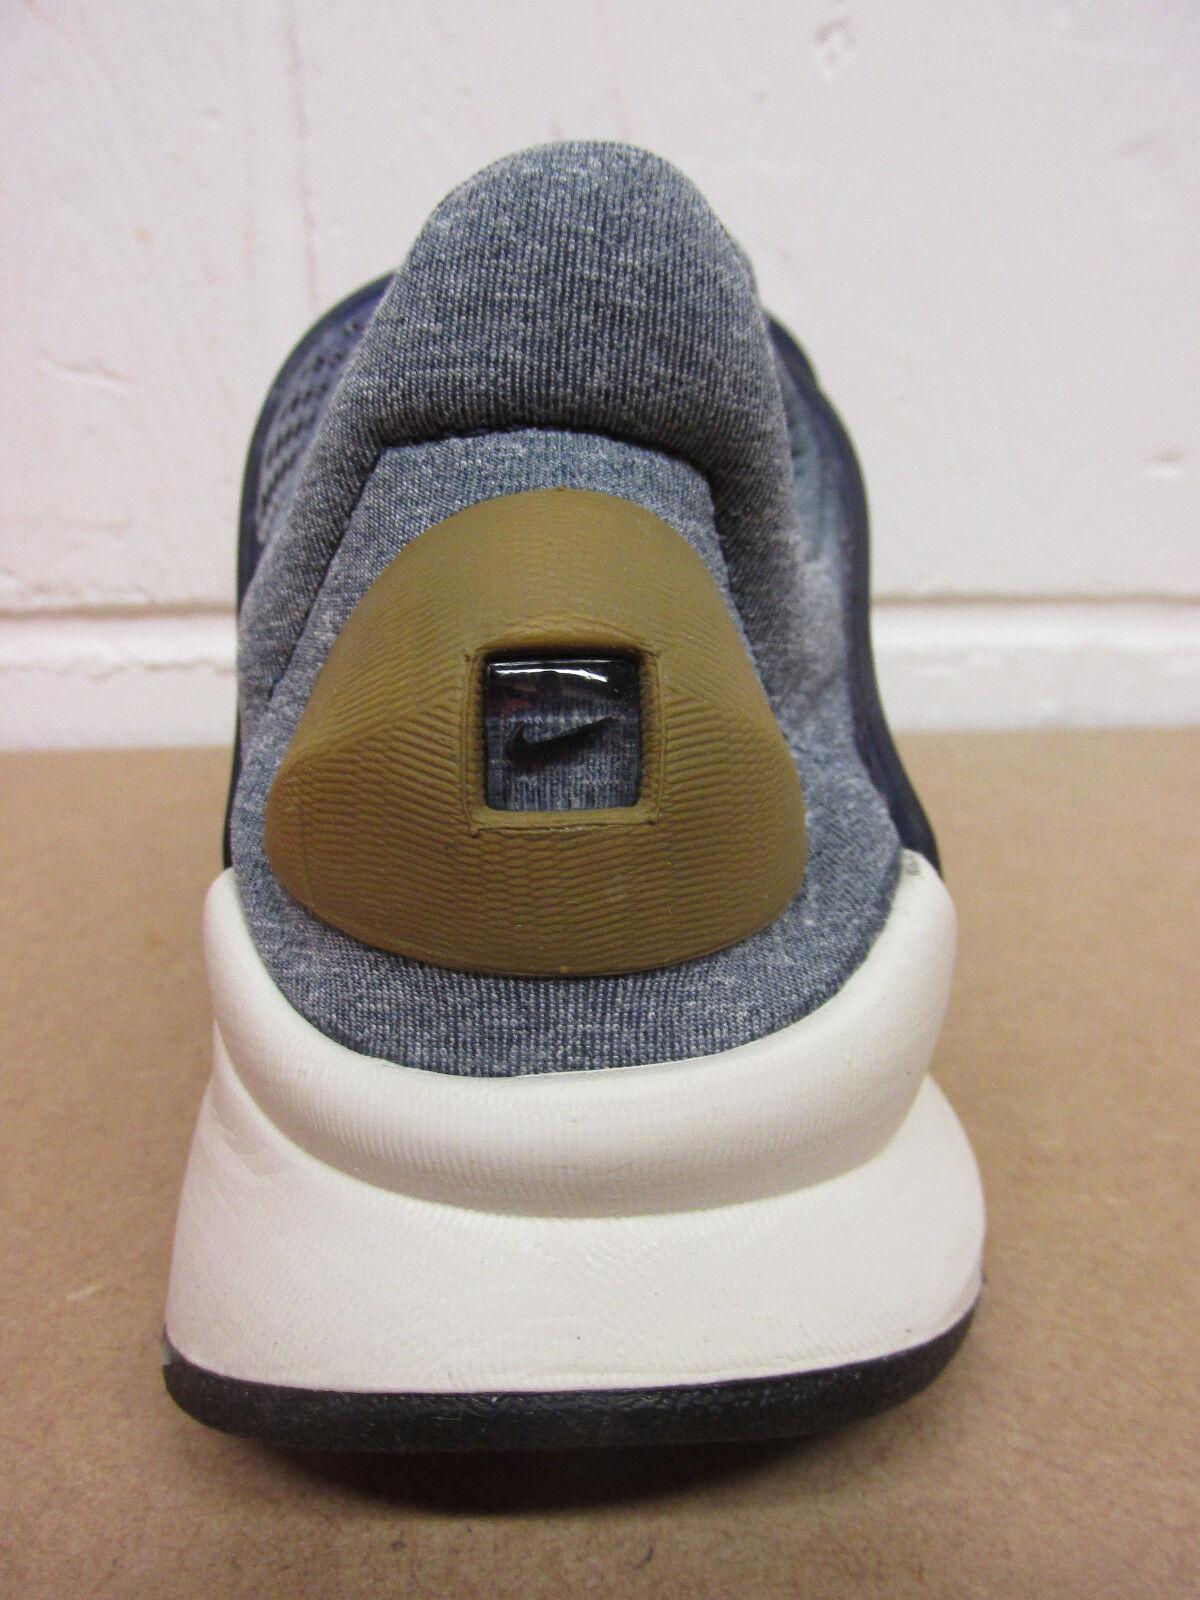 Nike Womens Sock Dart SE Running Running Running Trainers 862412 400 Sneakers Shoes 2d1153